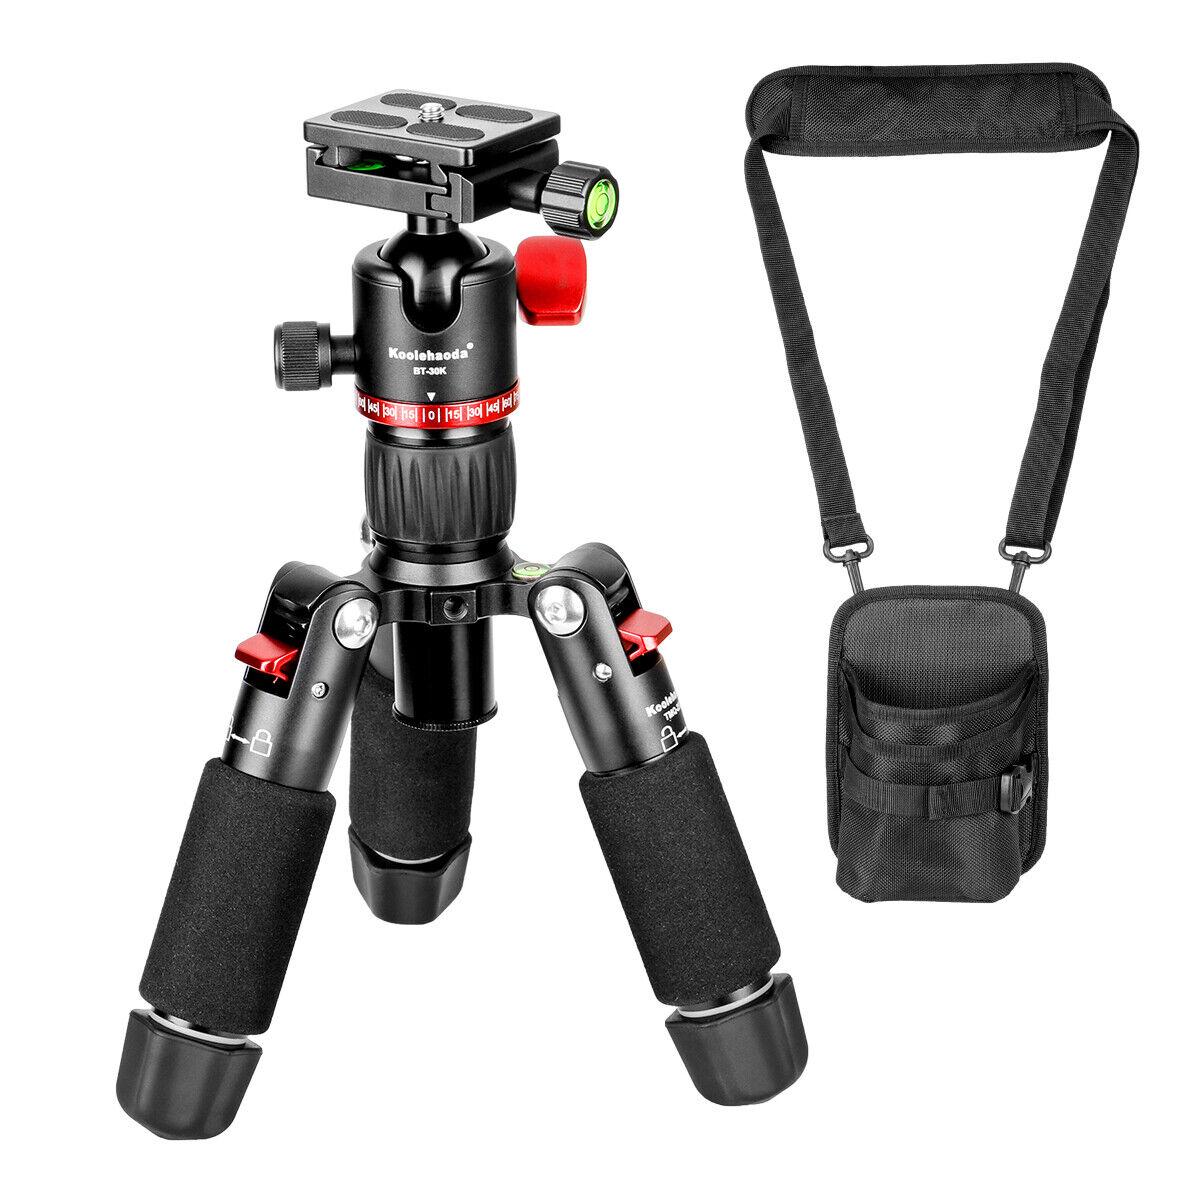 18inch Mini Tripod,Tabletop Camera Tripod with 360° Ball He